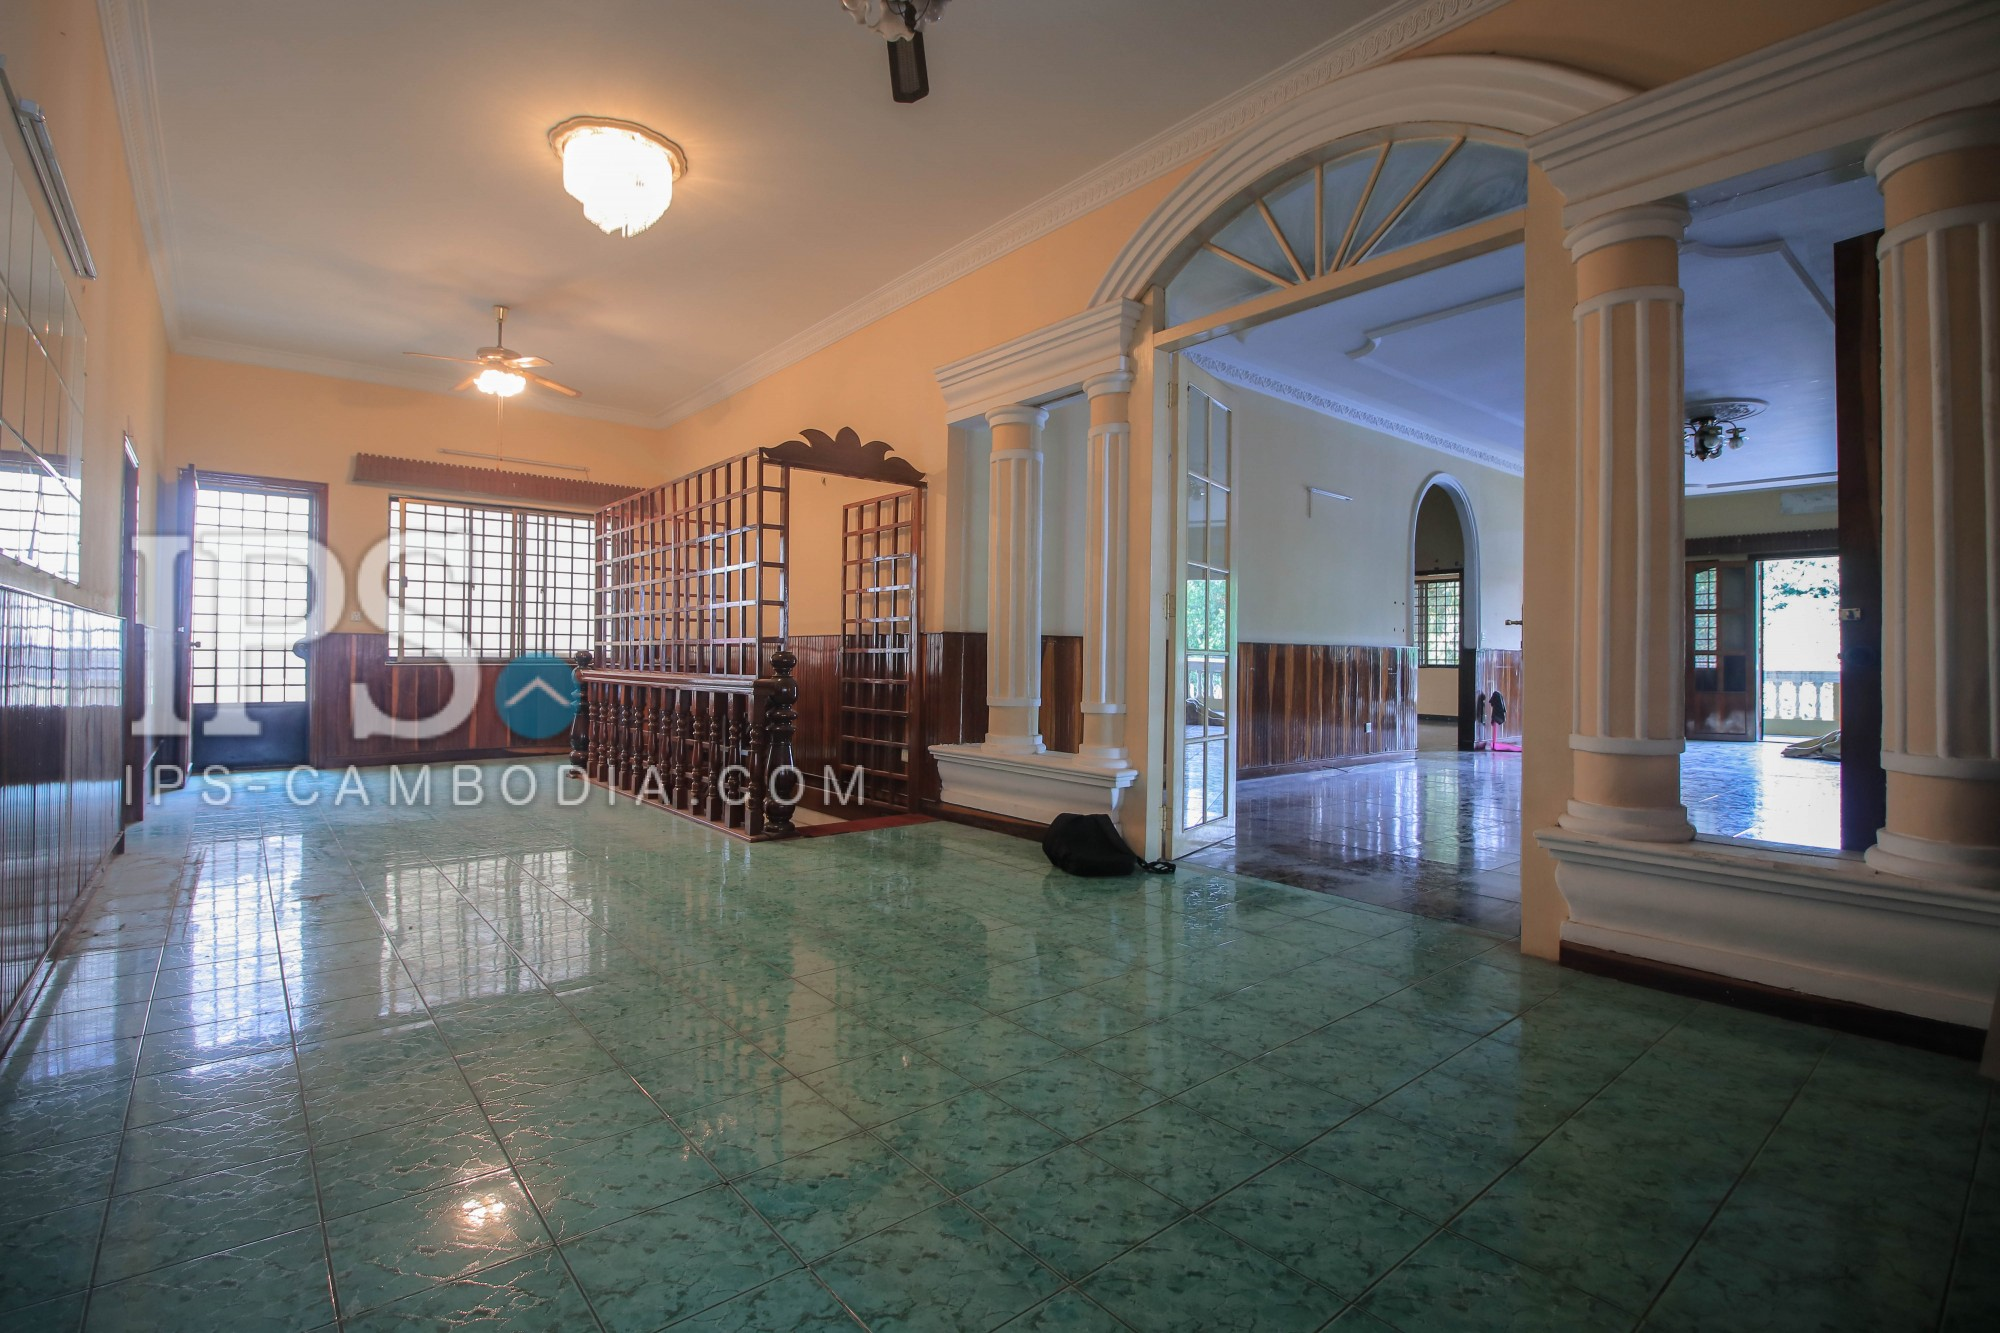 Villa For Rent - Boeung Keng Kang 1, Phnom Penh